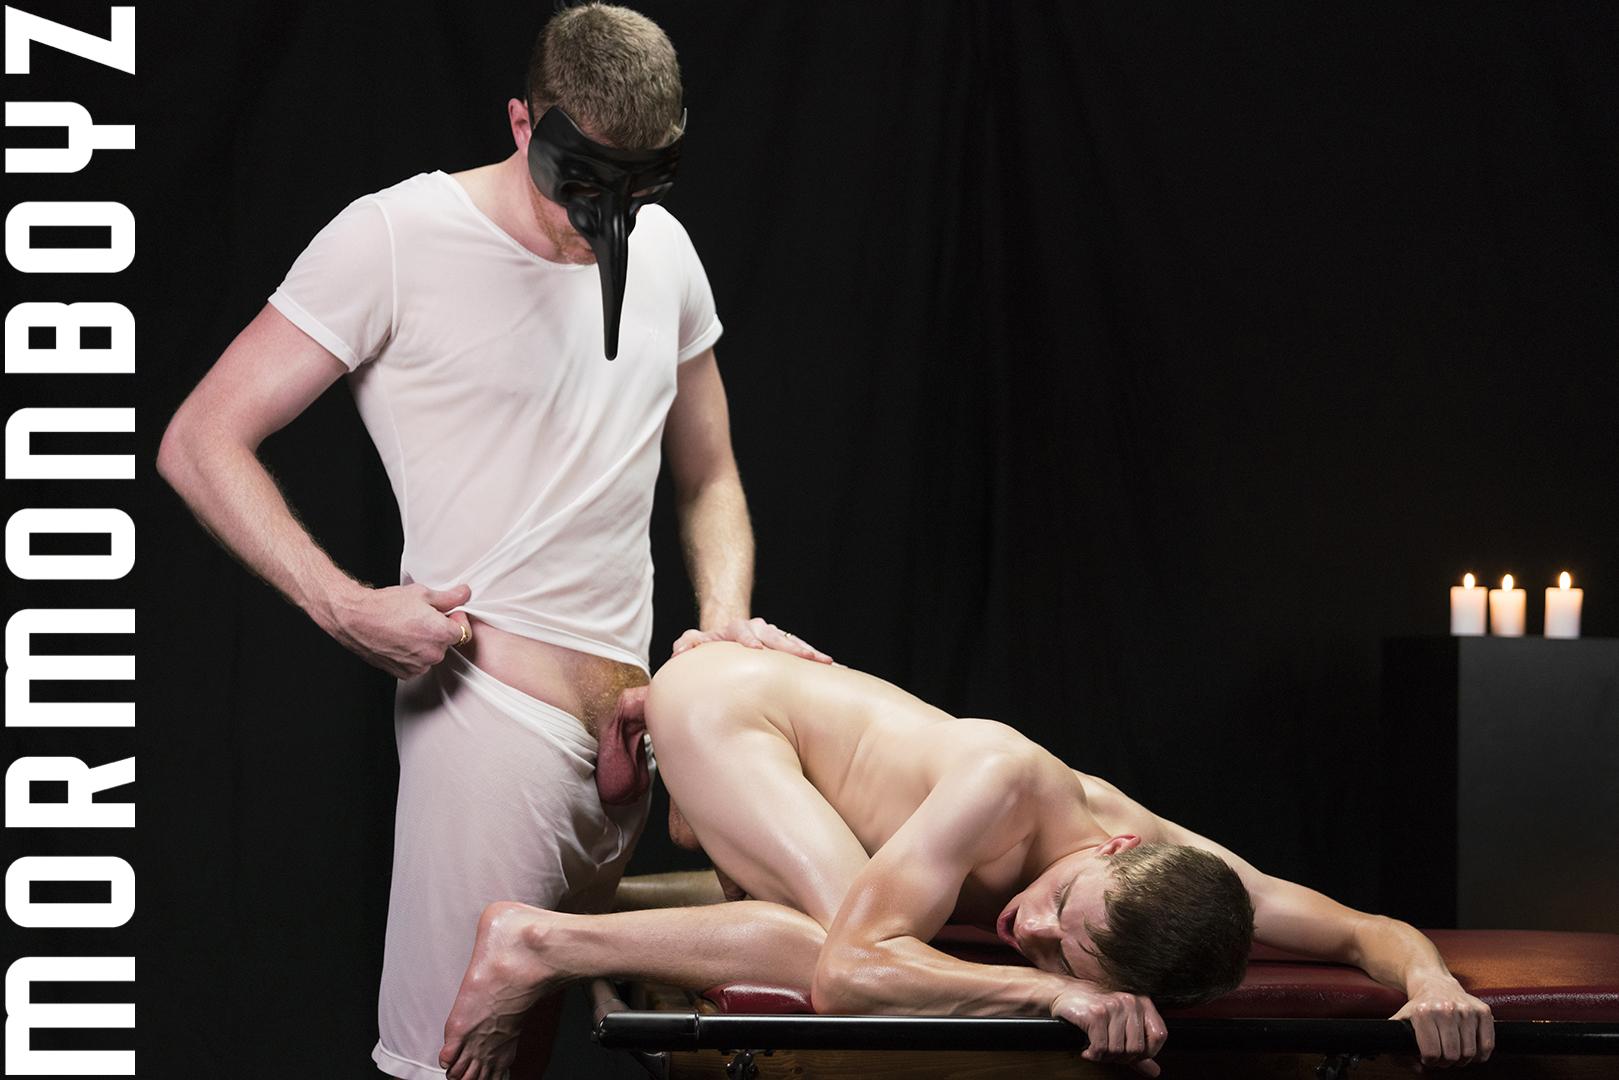 Mormon Boy Dalton Takes President Olsen's Raw Cock